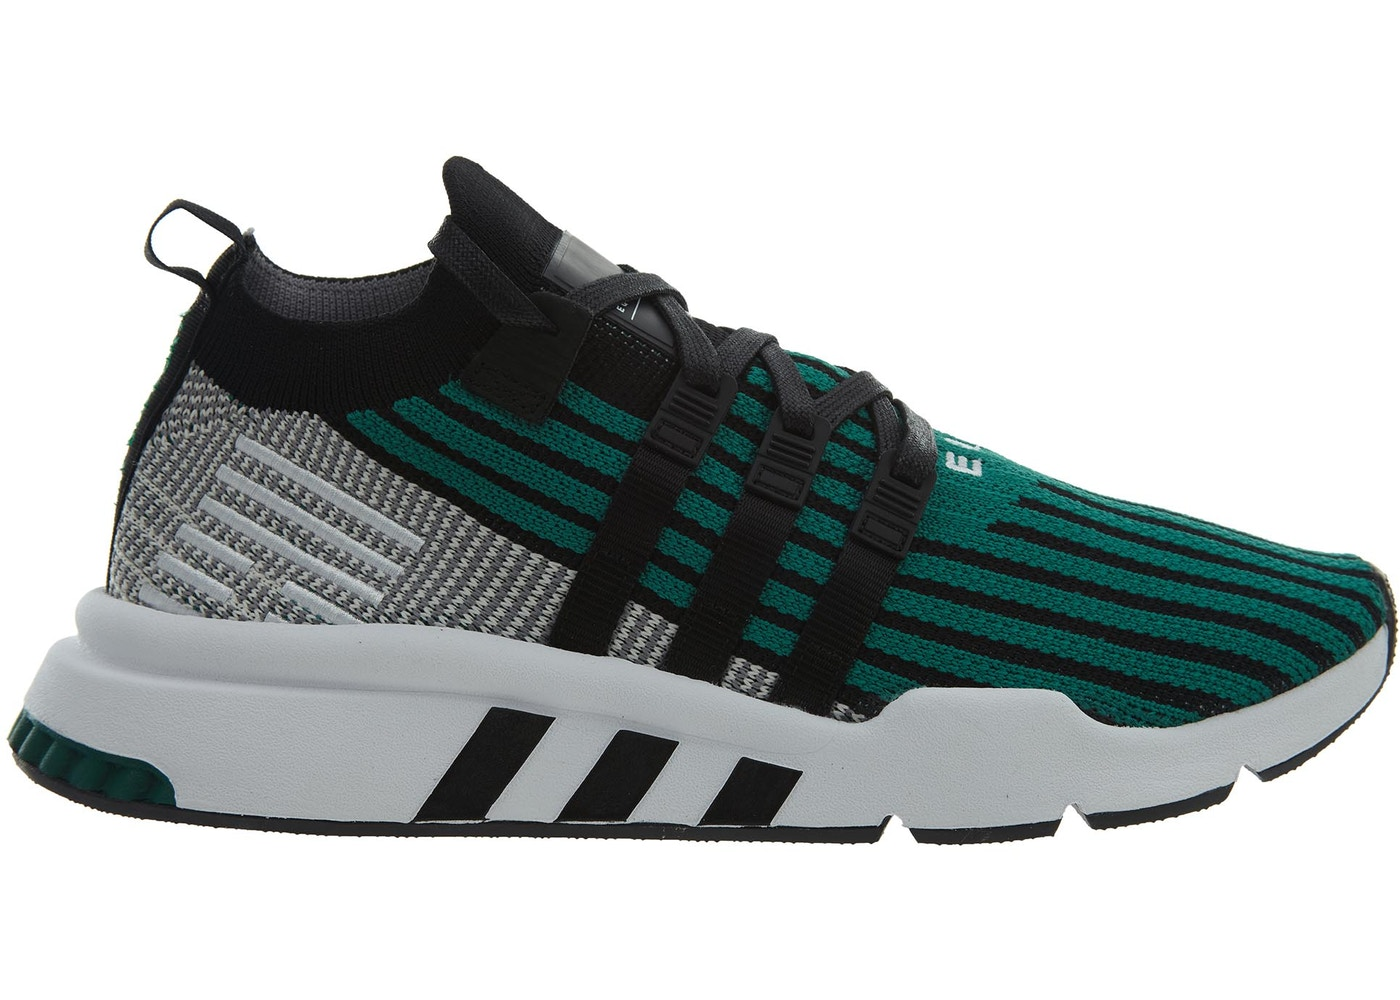 official photos 81888 b91c8 adidas Eqt Support Mid Adv Pk Black Black-Sub Green